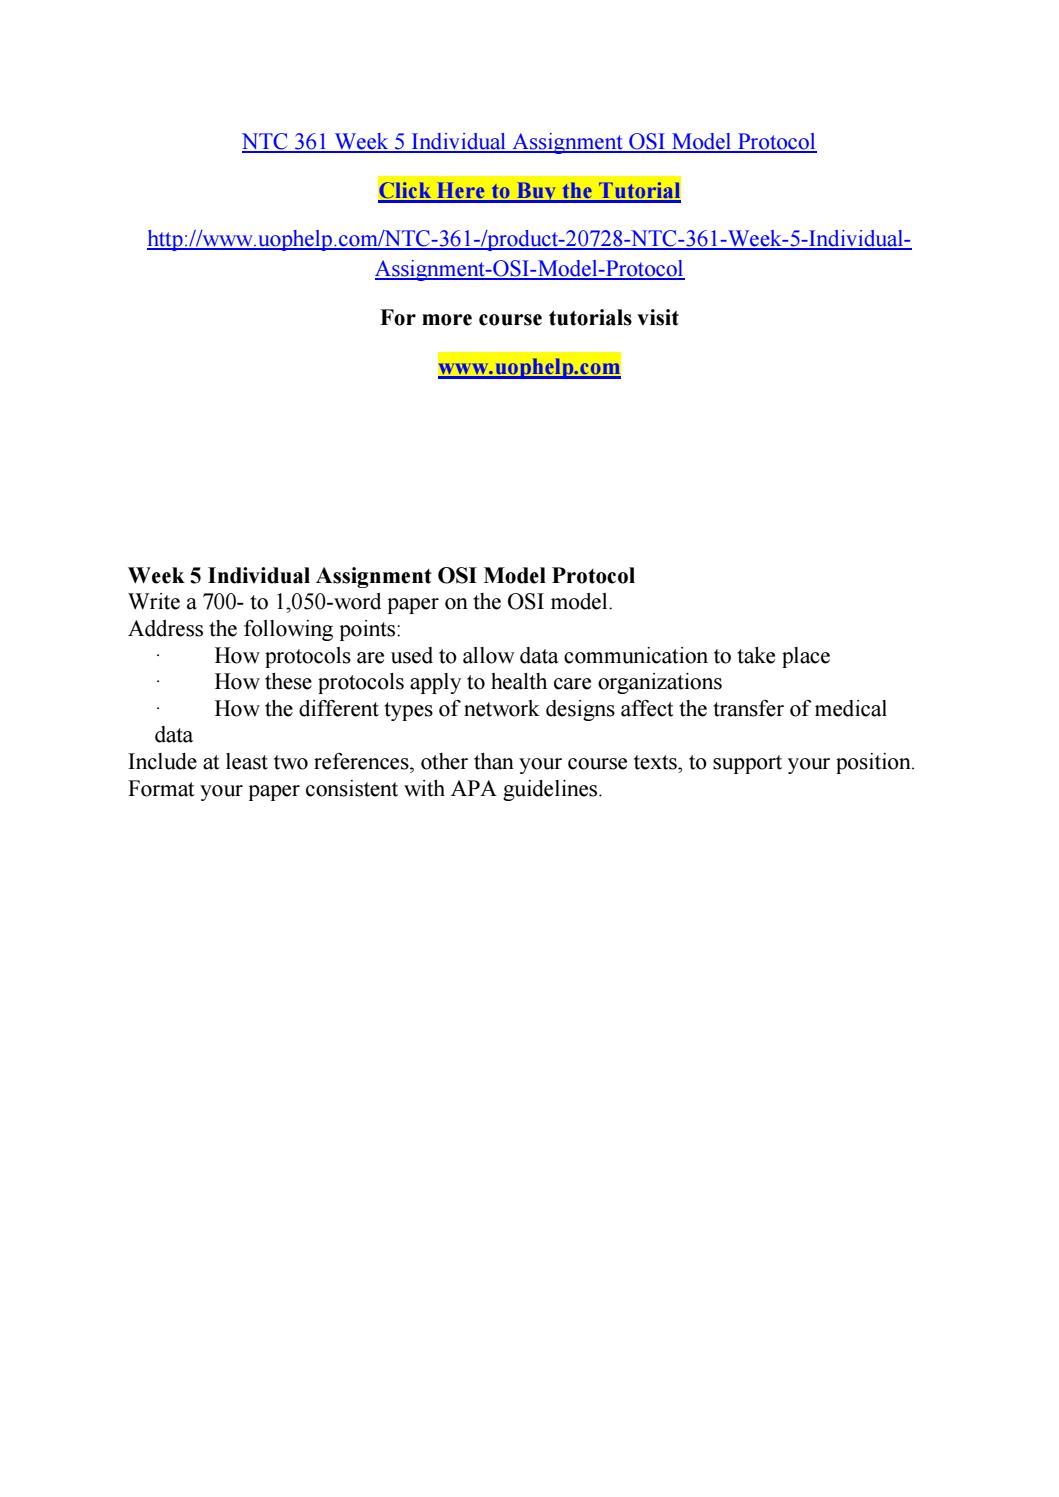 Ntc 361 week 5 individual assignment osi model protocol by ntc 361 week 5 individual assignment osi model protocol by olymopicgamesriogust2016 issuu baditri Gallery